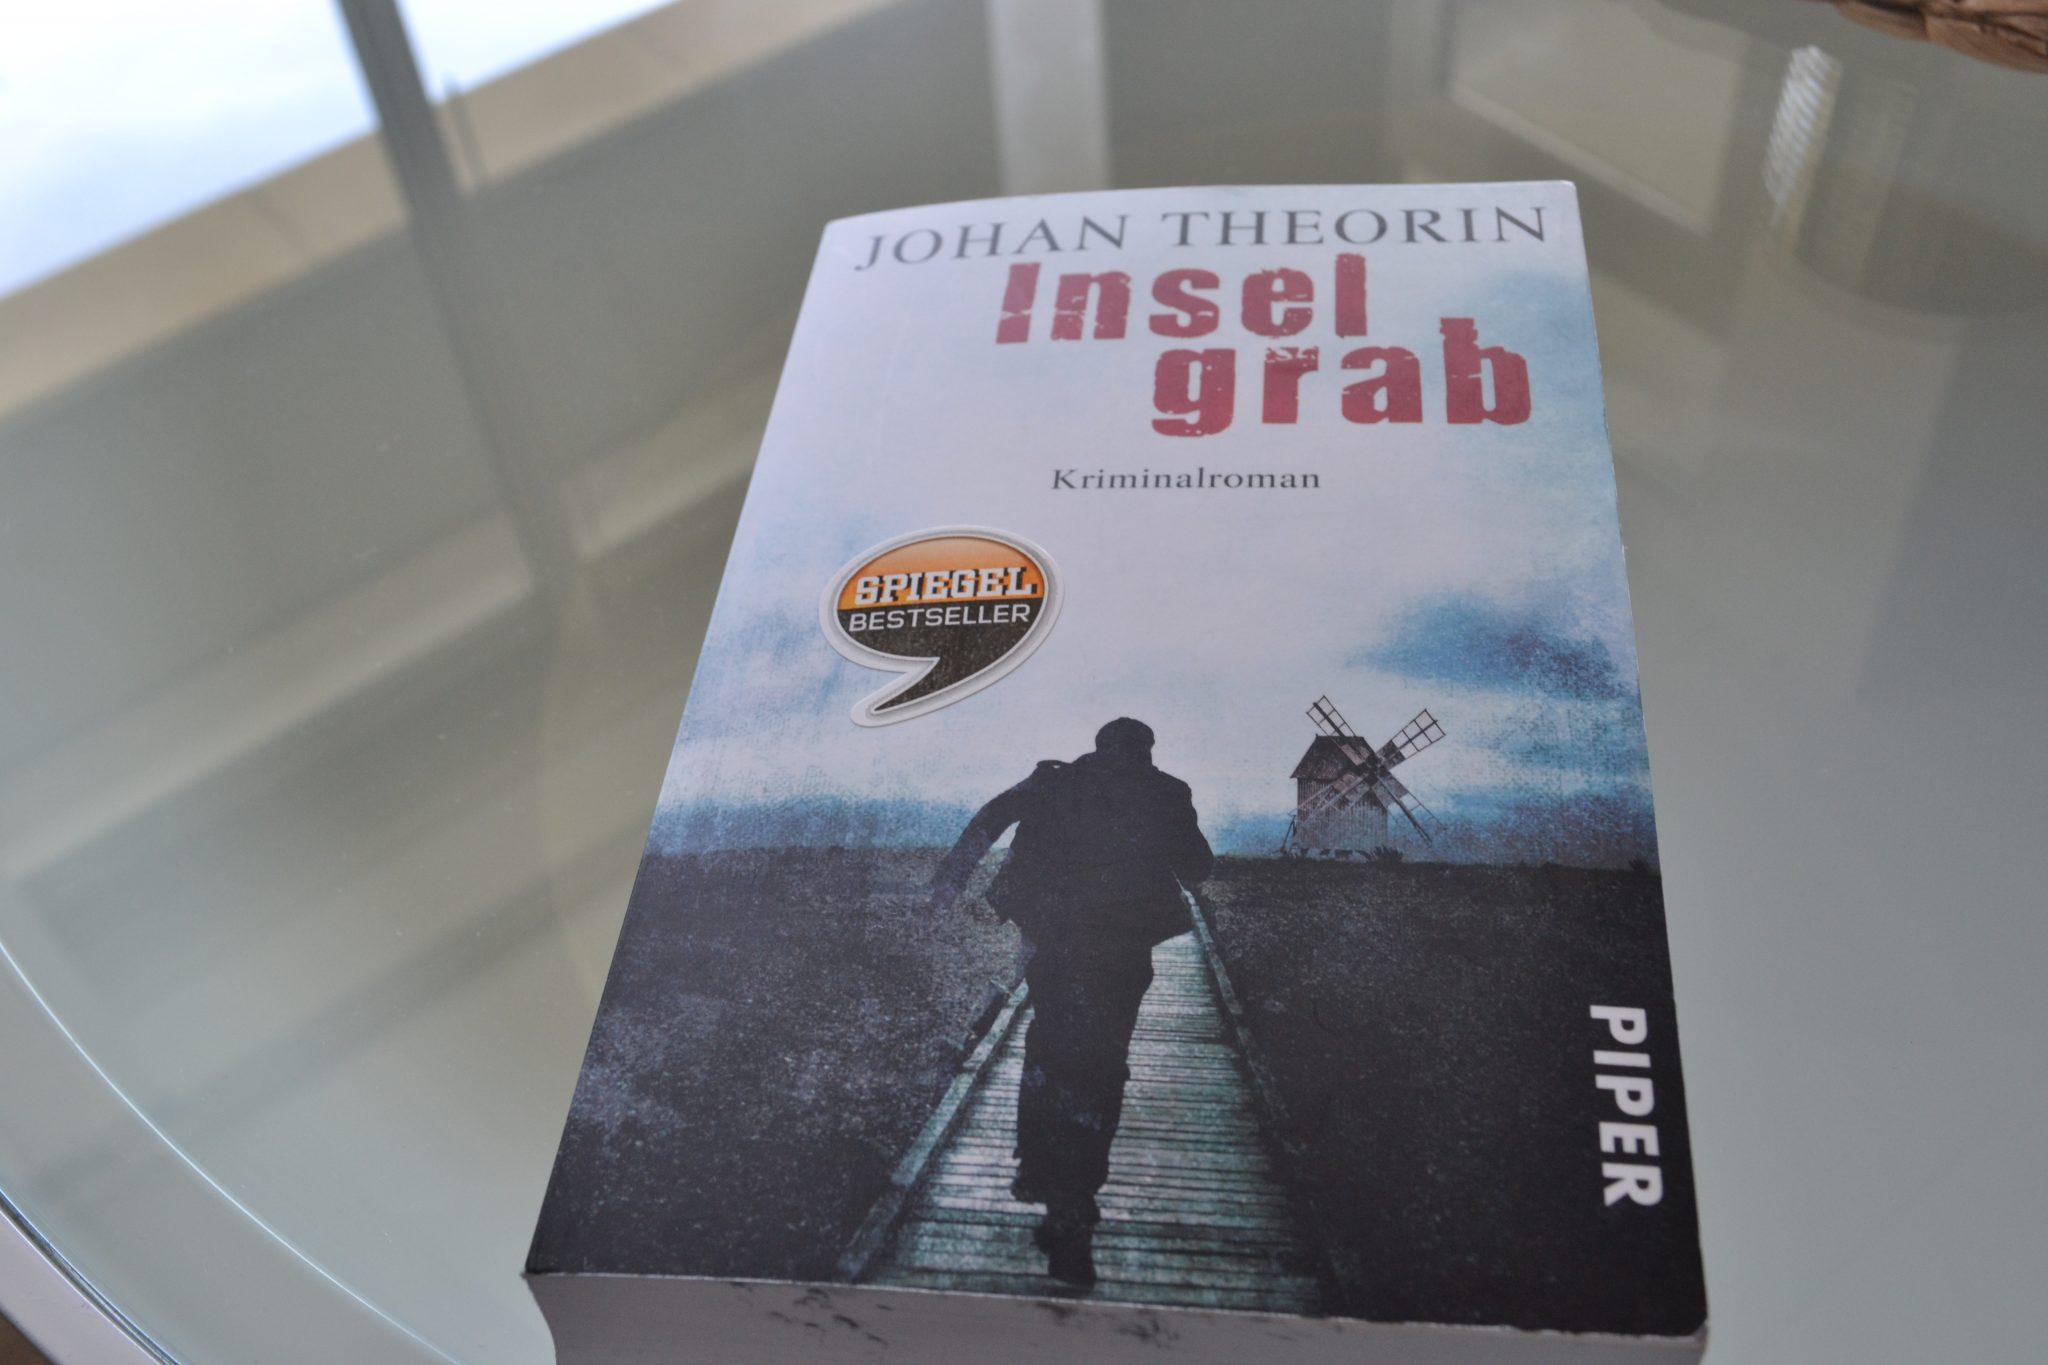 Books: Inselgrab | Johan Theorin - DSC 0311